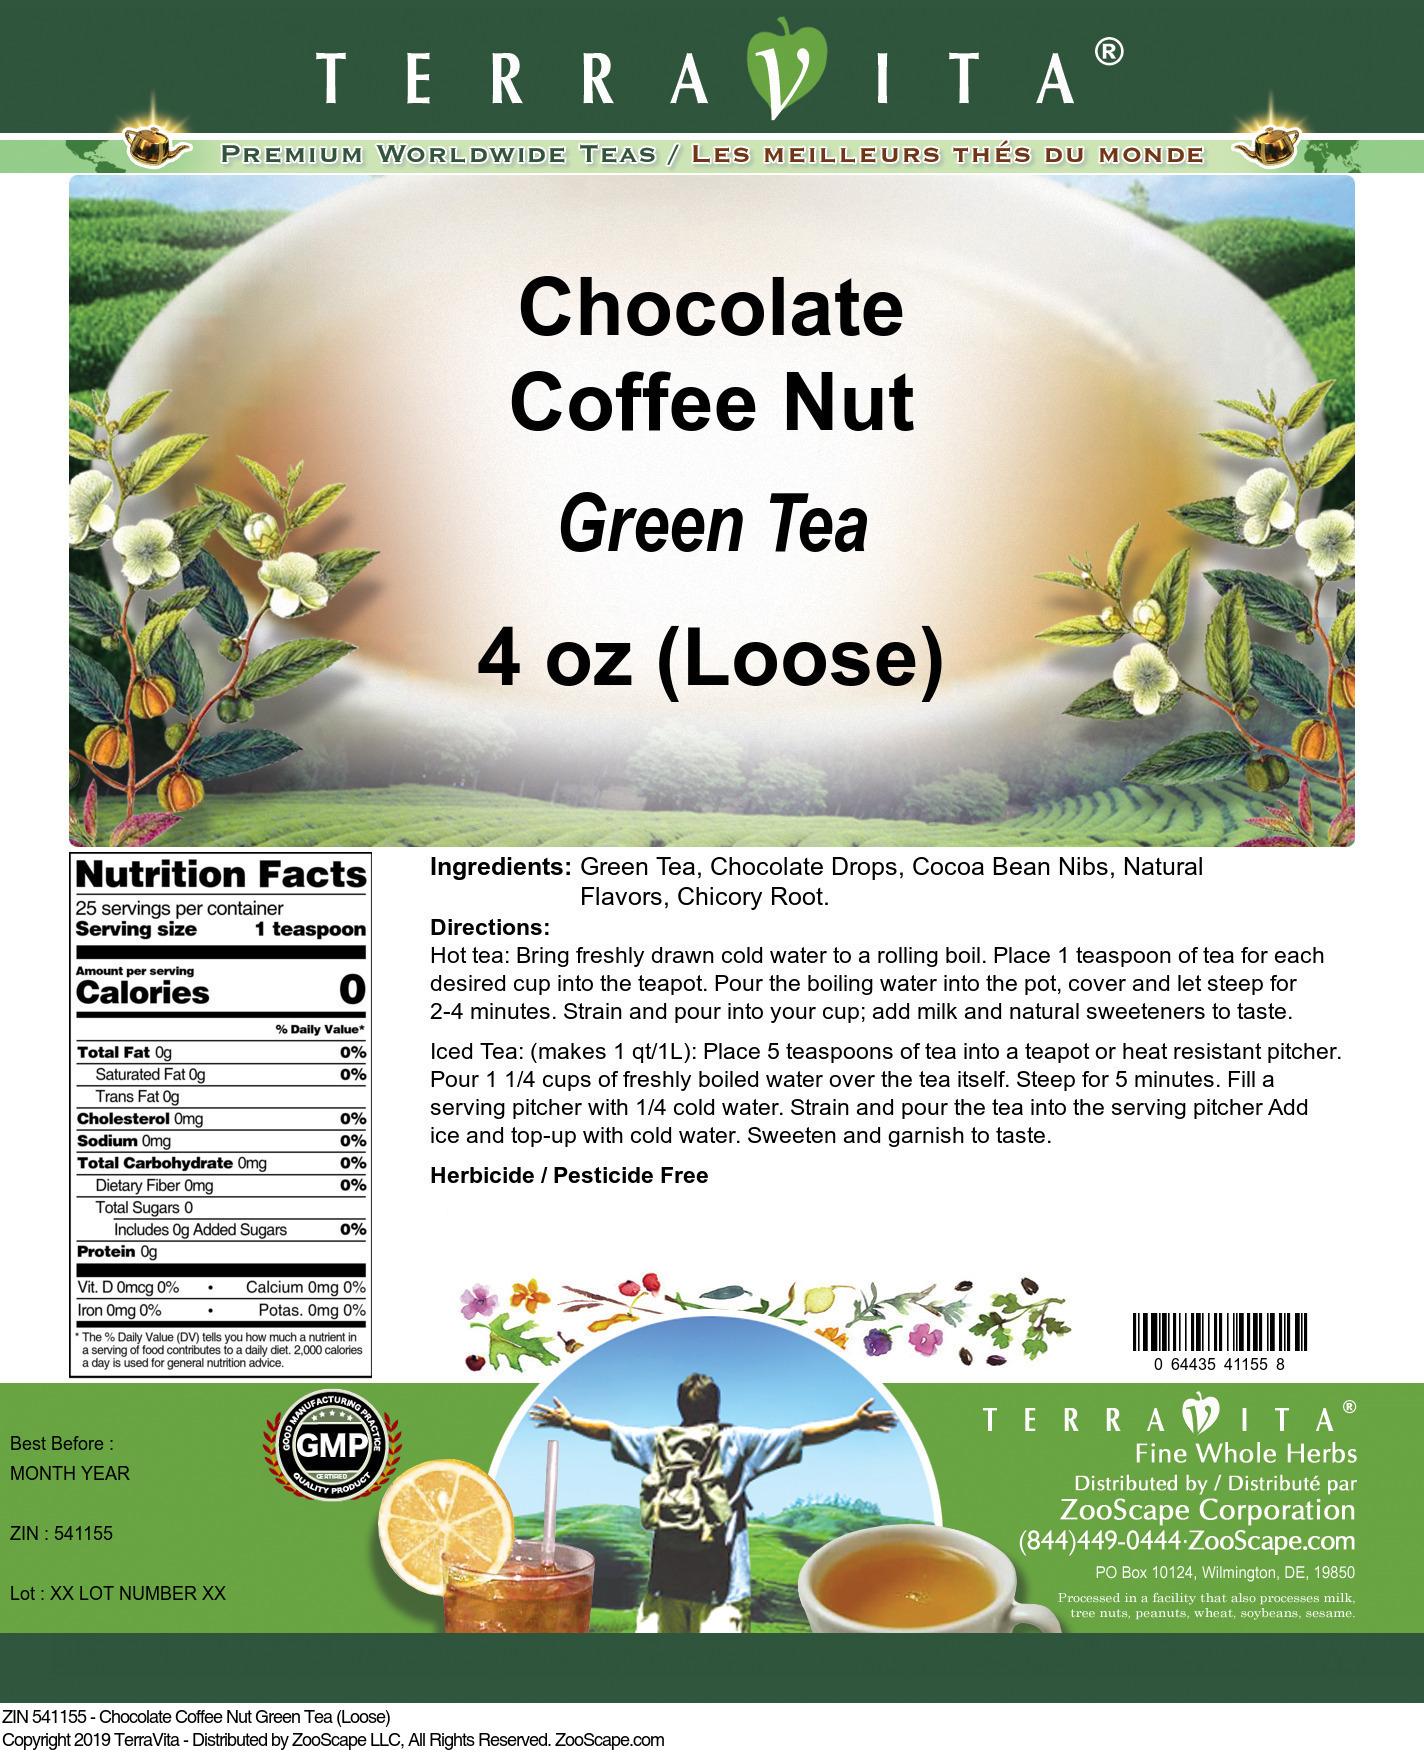 Chocolate Coffee Nut Green Tea (Loose)